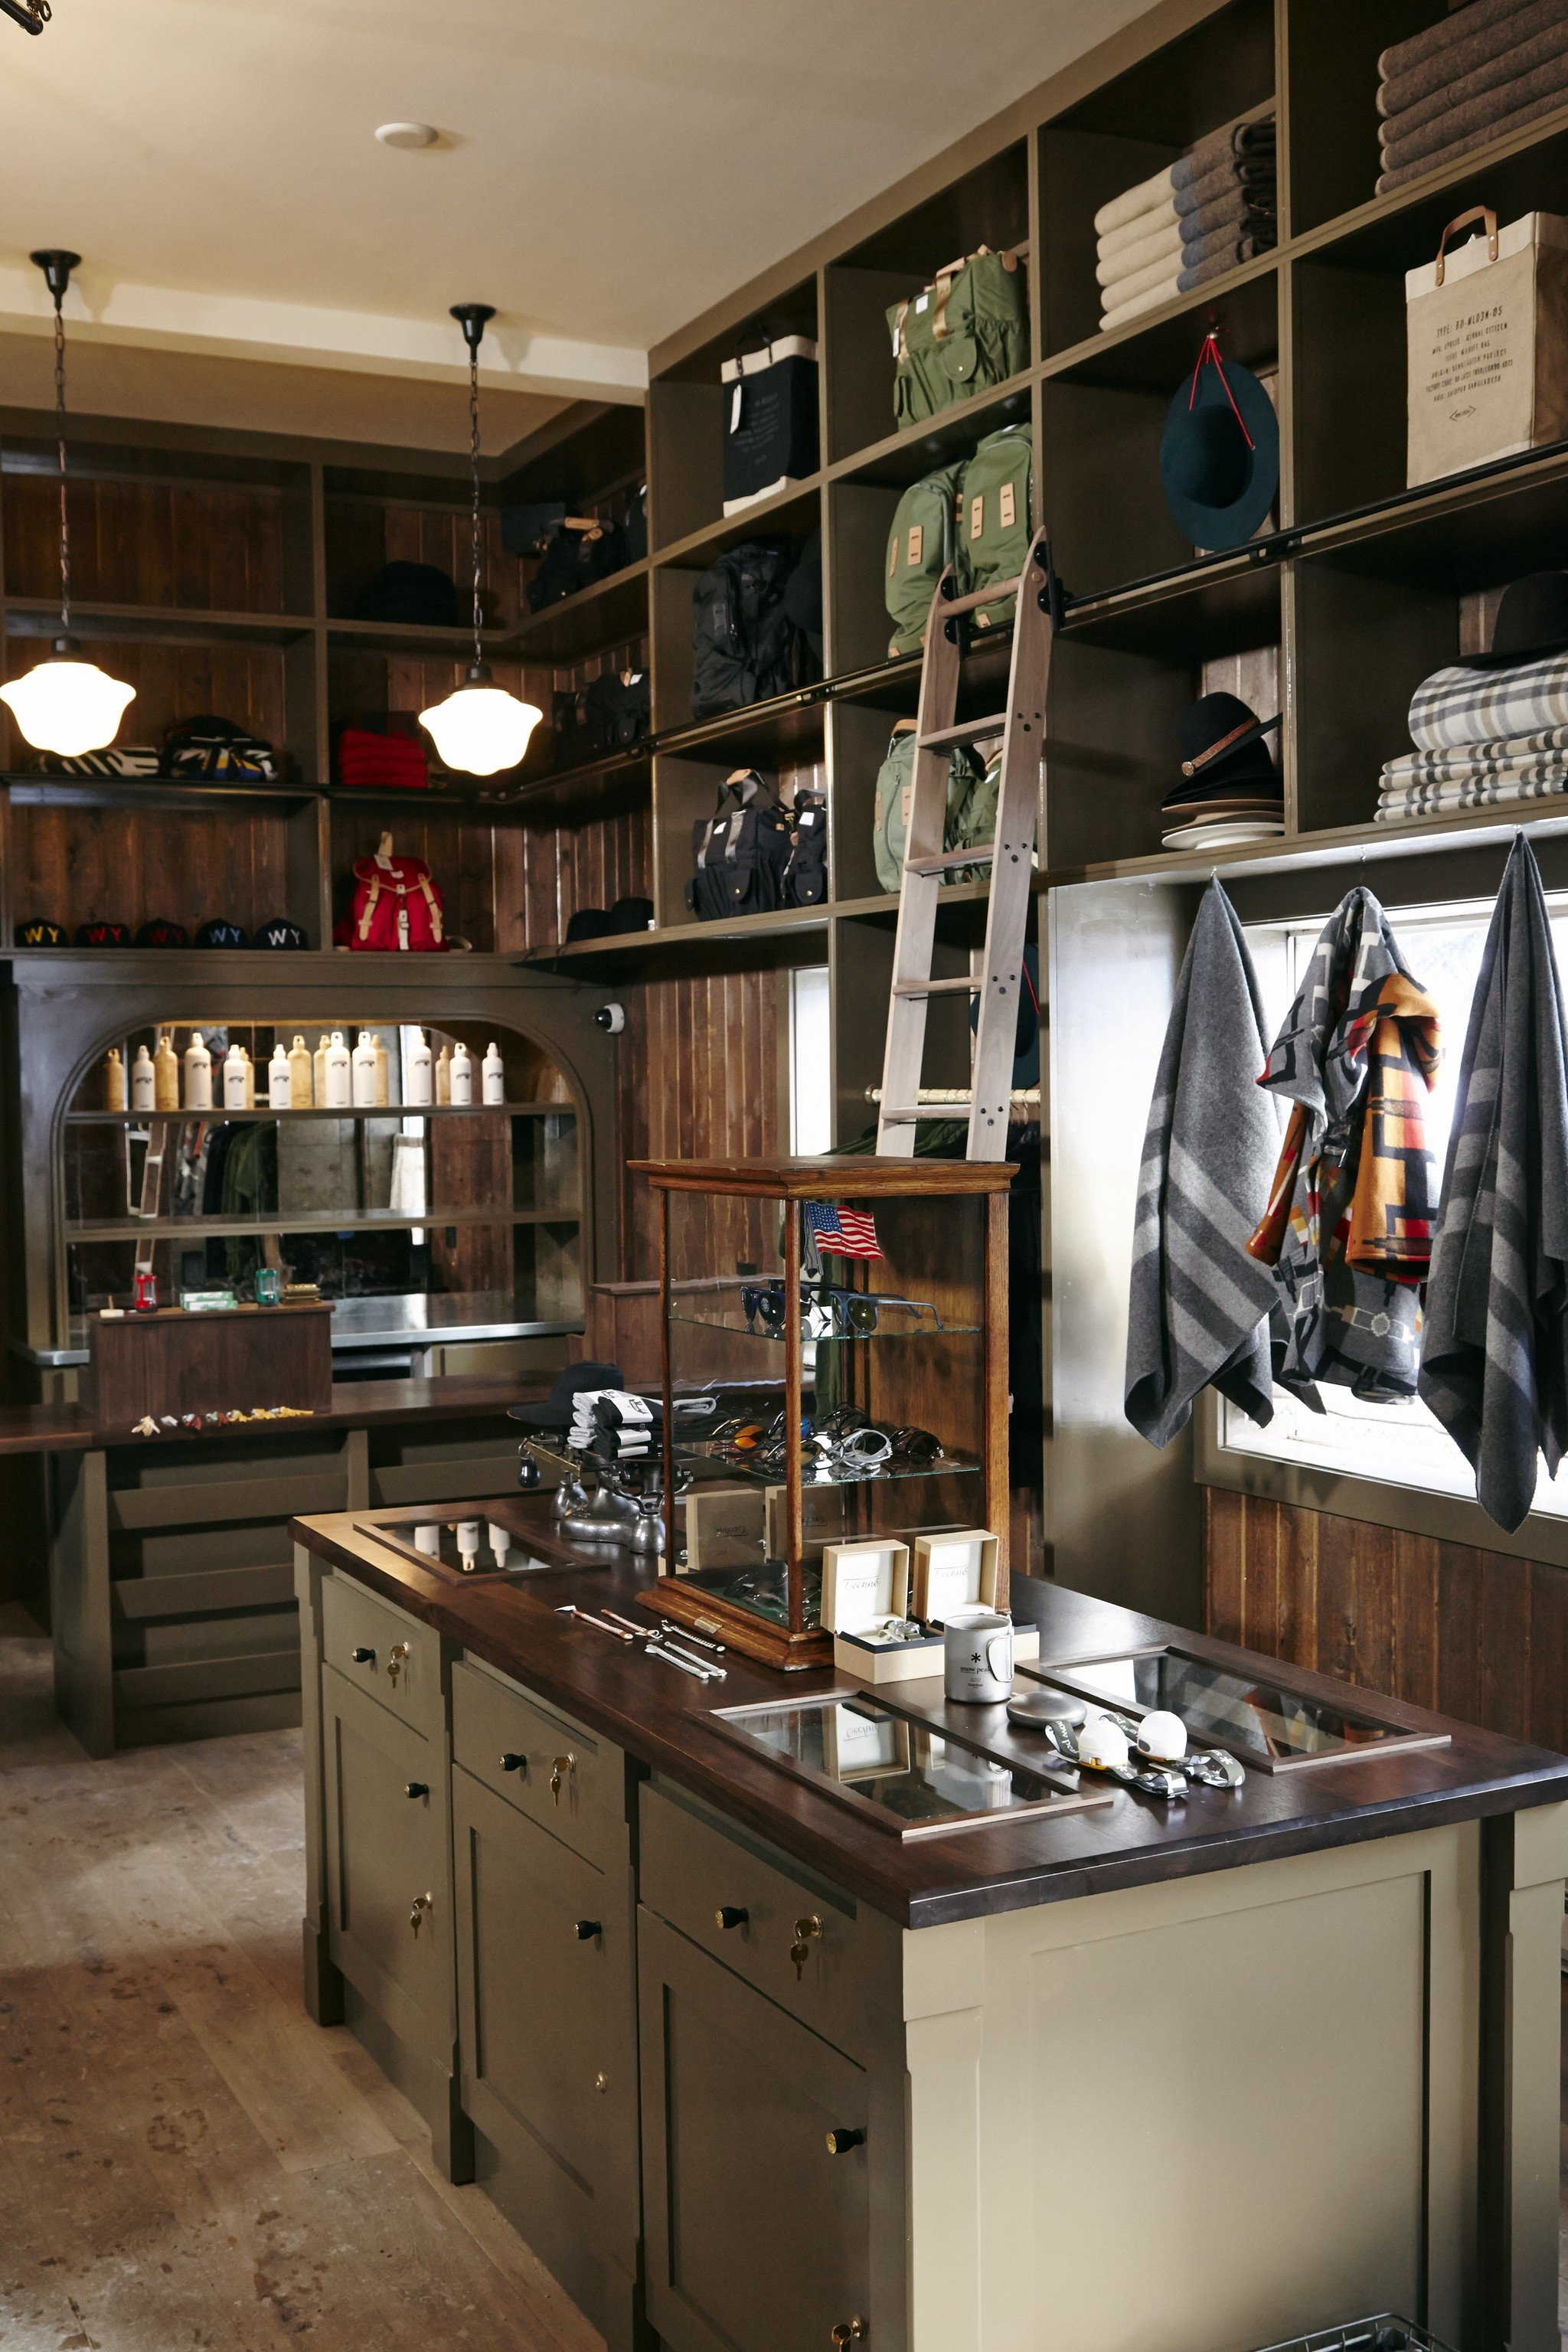 Hotels indoor room property Kitchen cabinetry home interior design furniture Design wood appliance